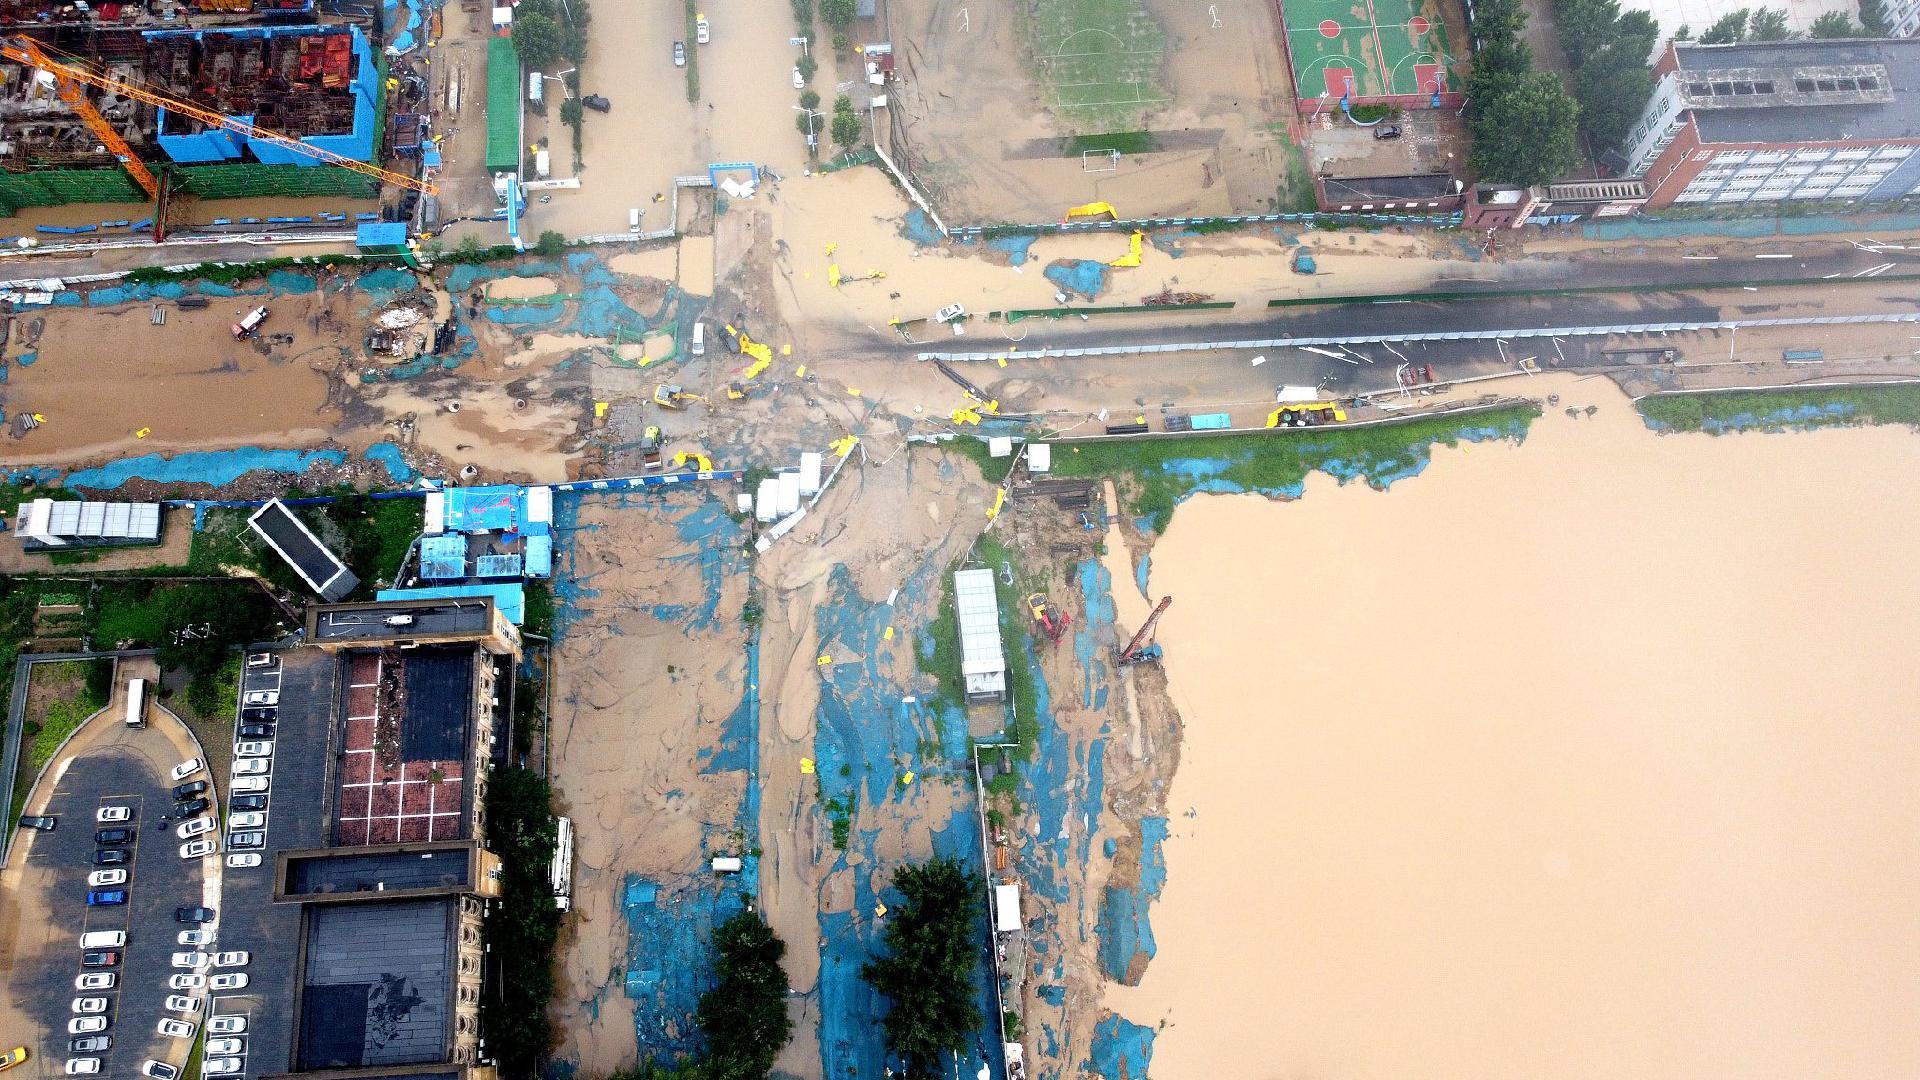 Aerial video shows alarming water levels in communities of Zhengzhou - CGTN